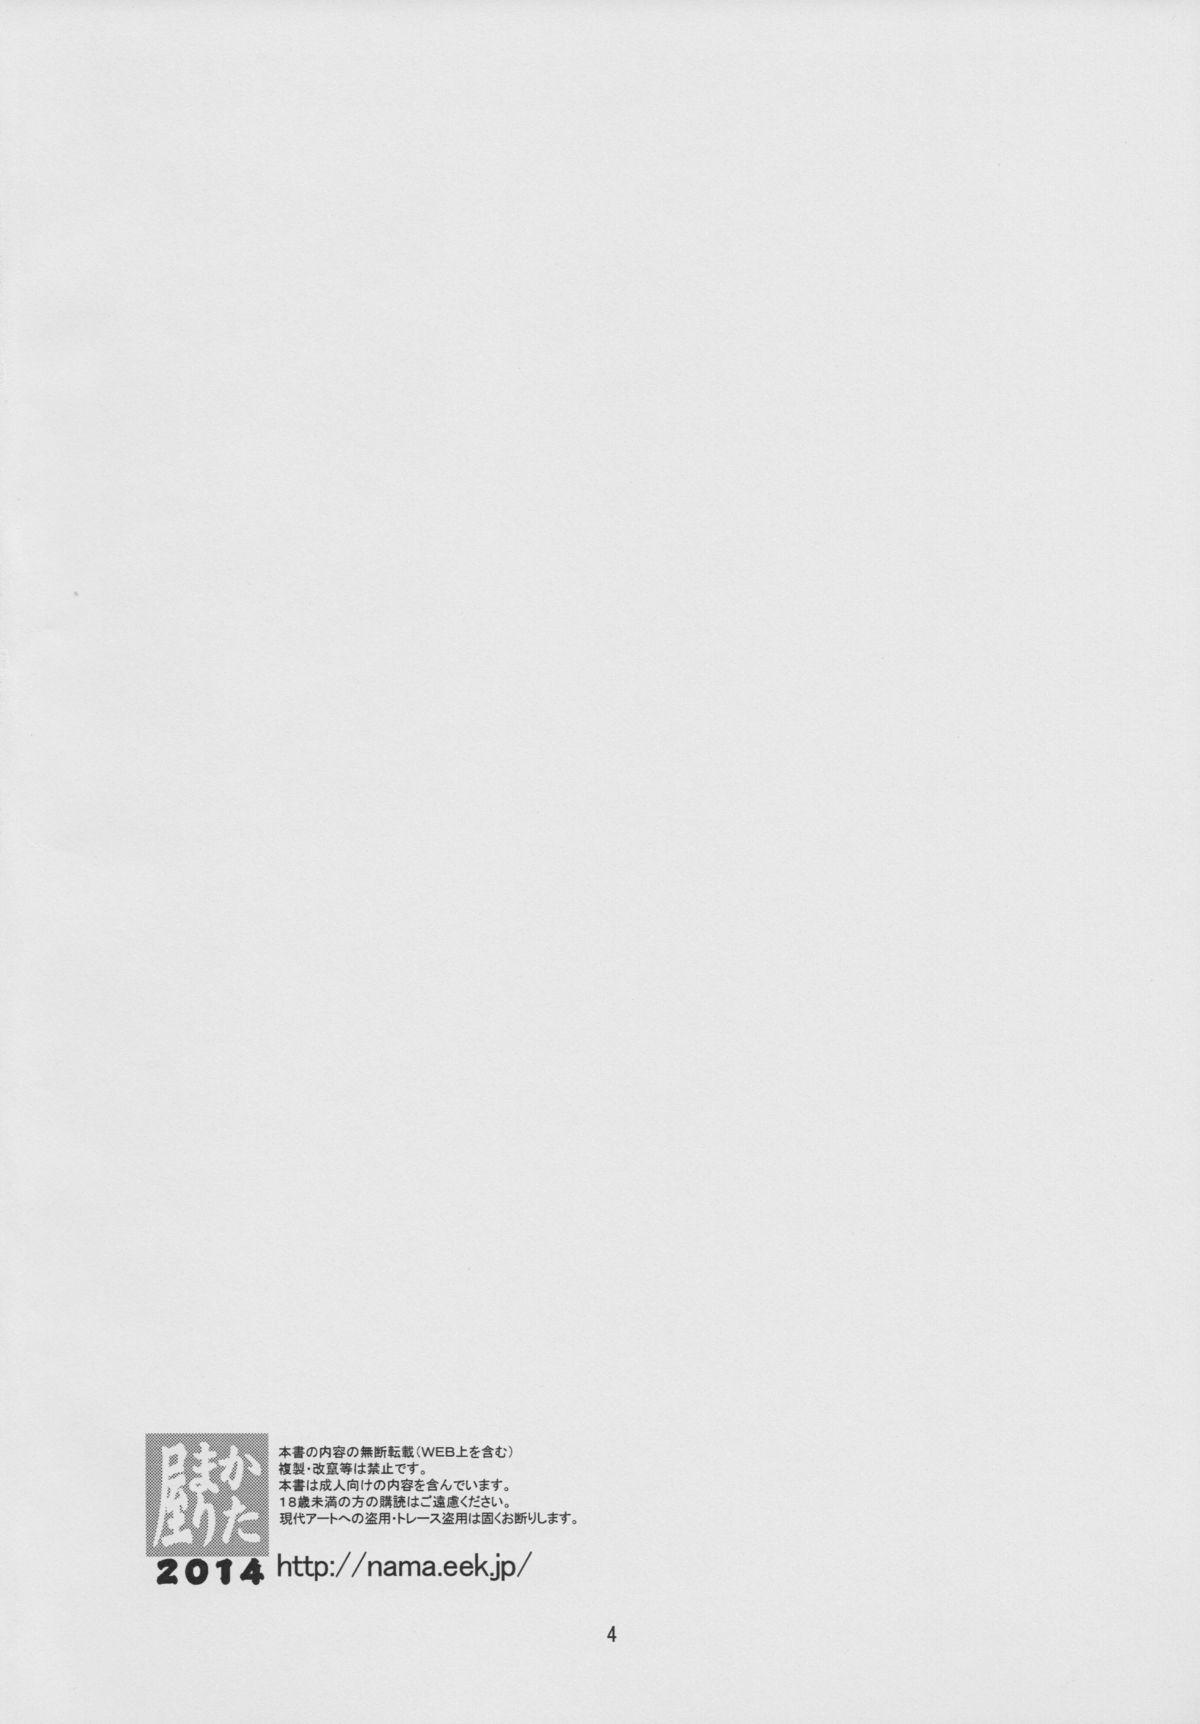 (C86) [KATAMARI-YA (Kanetsuki Masayoshi, Shinama) DevilAX (Puella Magi Madoka Magica) 3